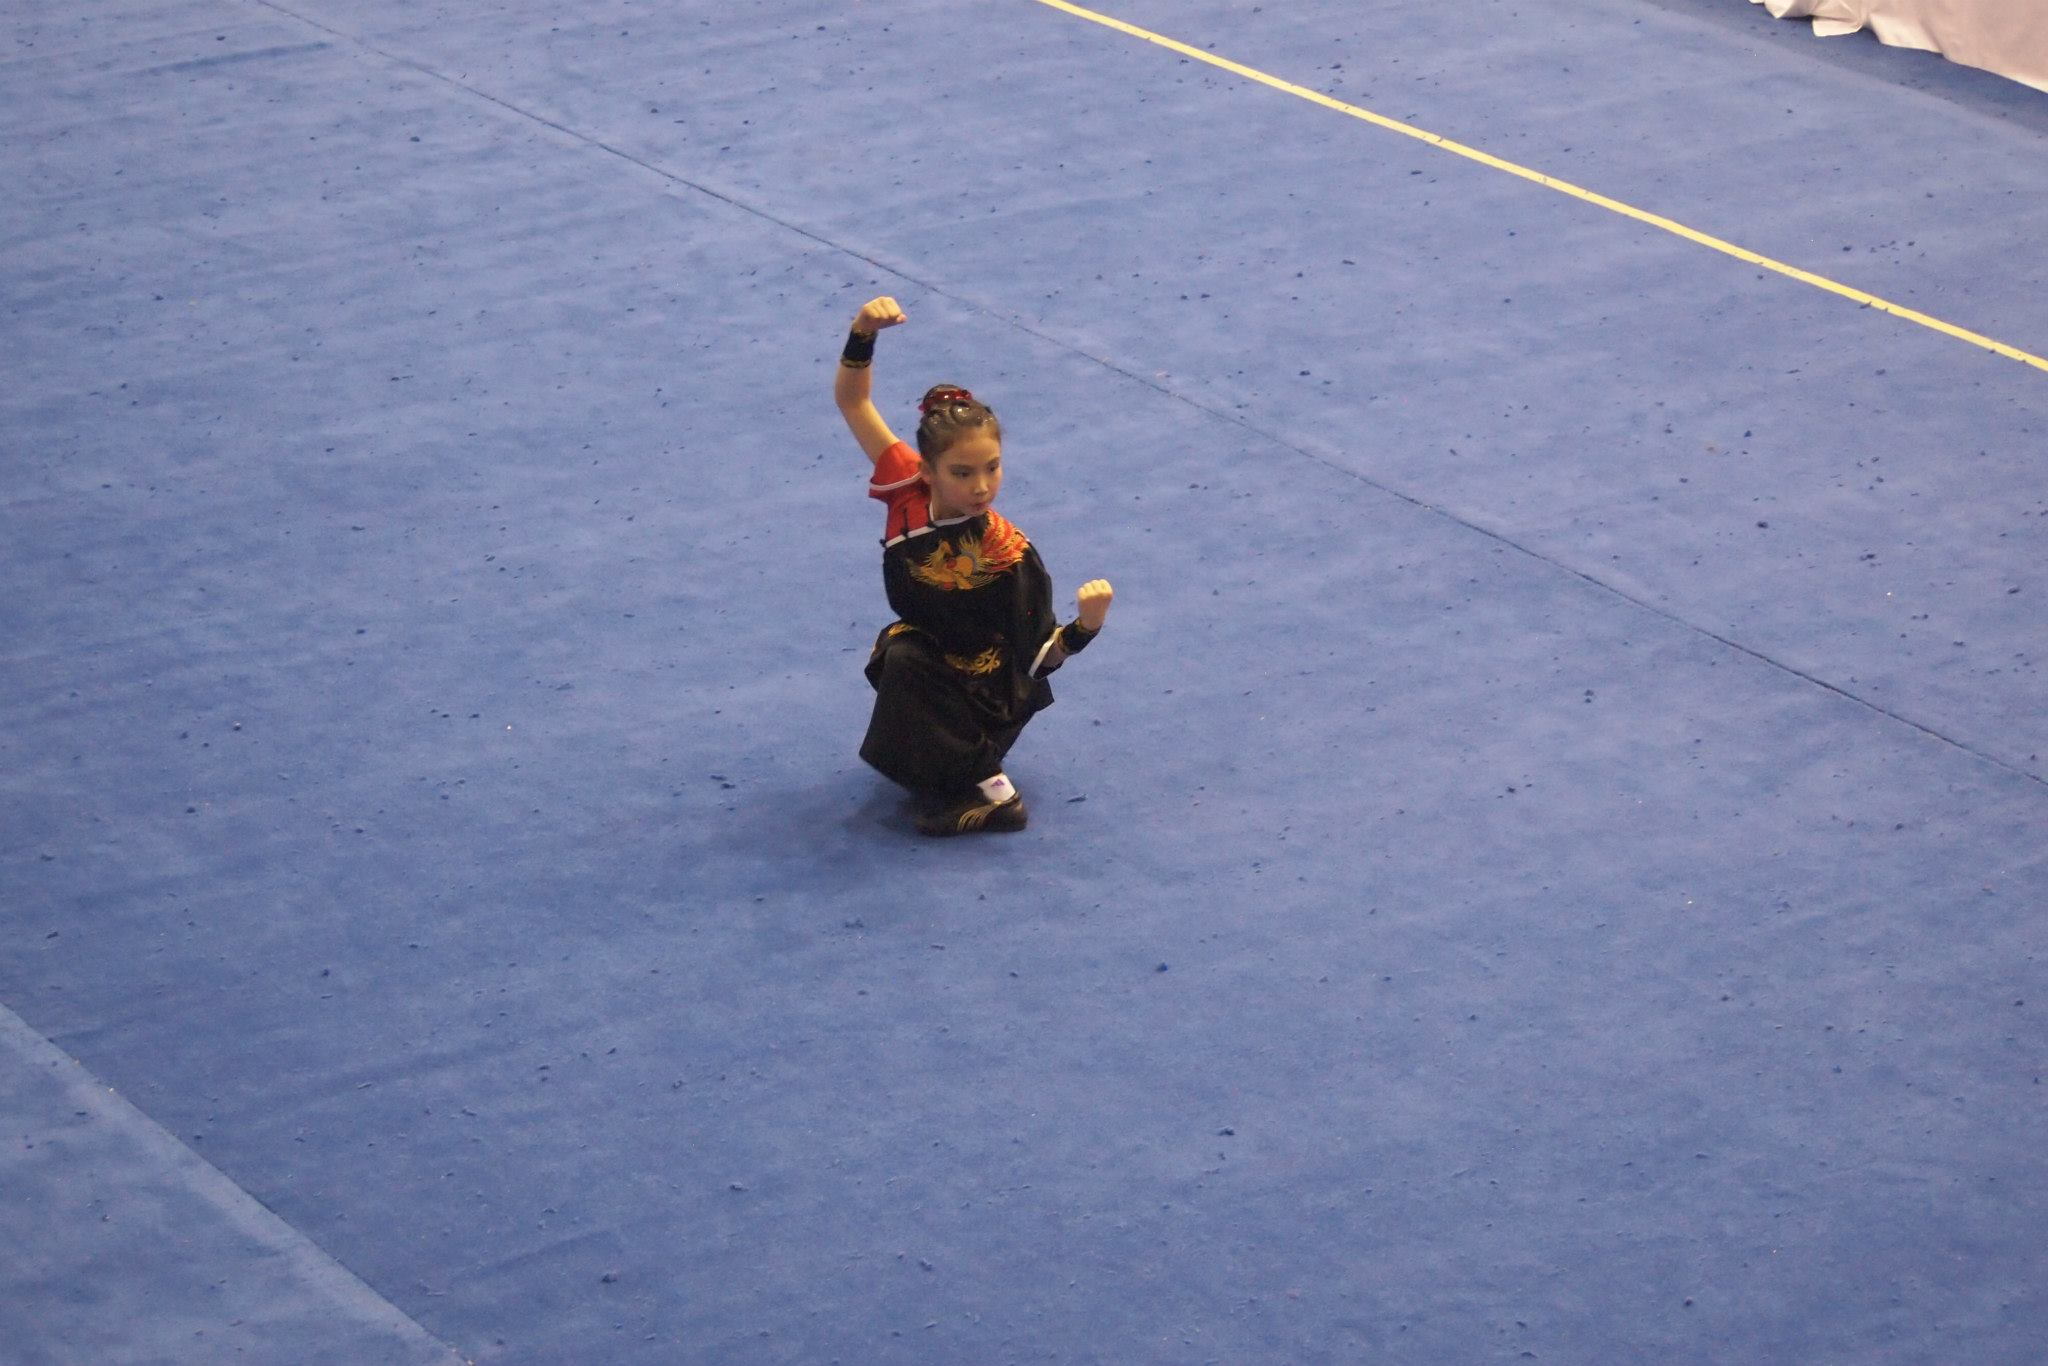 Wayland_Li_Wushu_World_Junior_Championships_2014_Team_Canada_in_Turkey_Erica_2.jpg